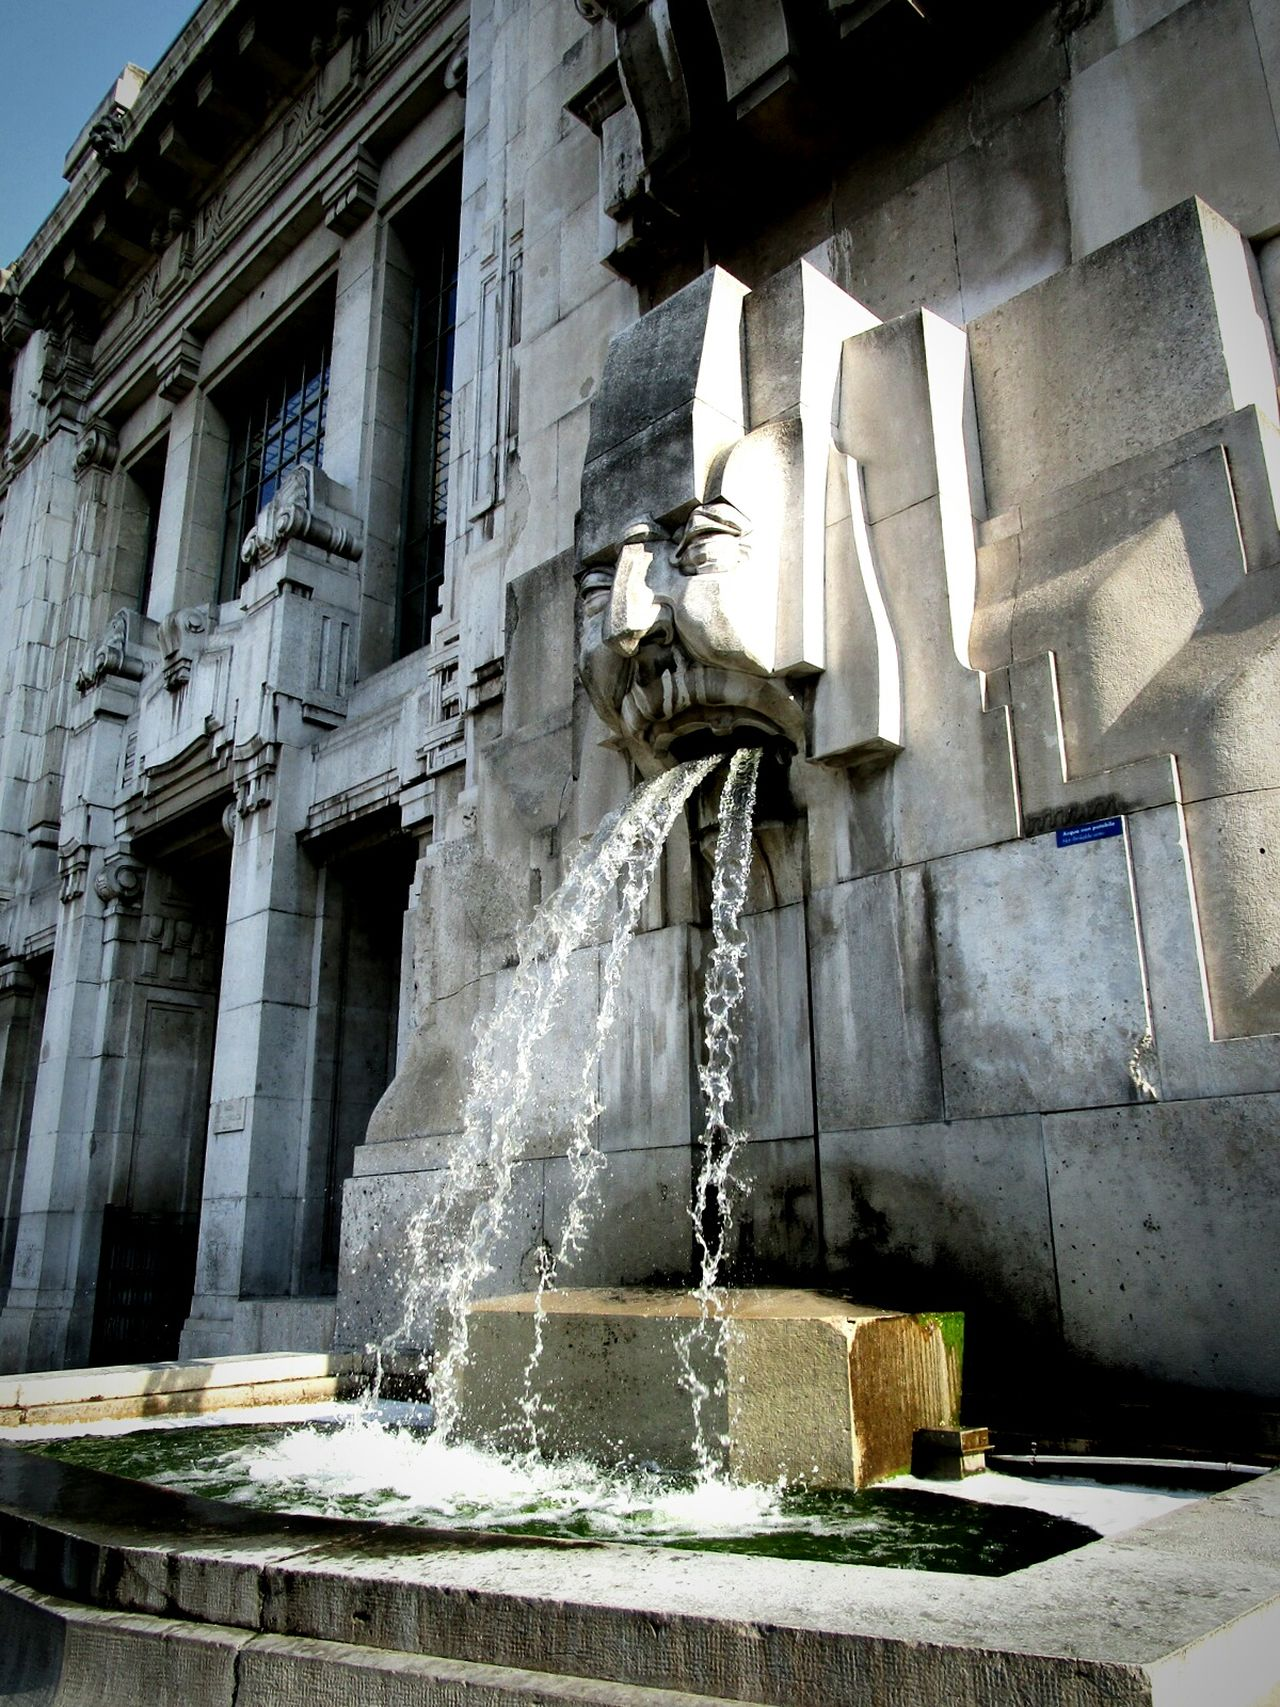 Milan Fountain Fun Fountain Urban Lifestyle Water City Life Architectural Feature Architectural Detail Railroad